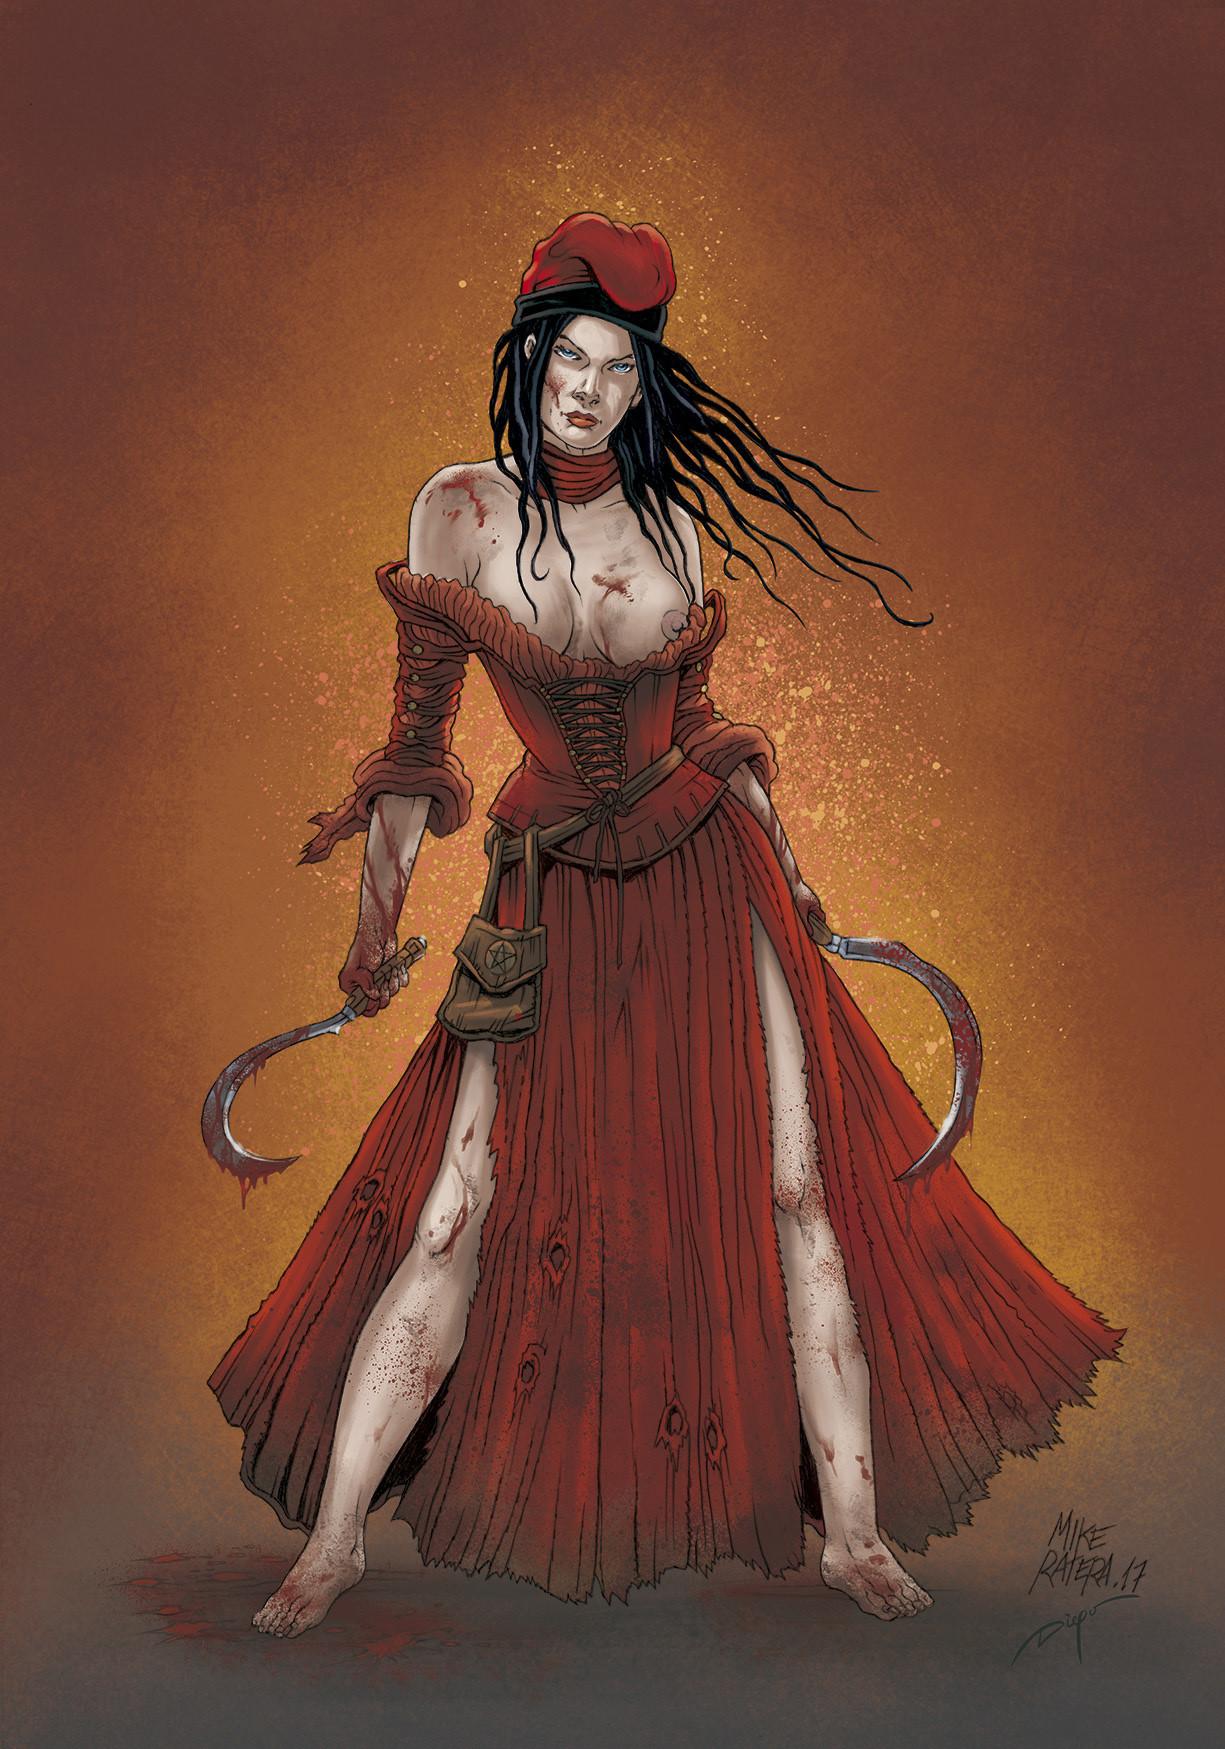 Mike ratera segadors reaper girl concept 3 color